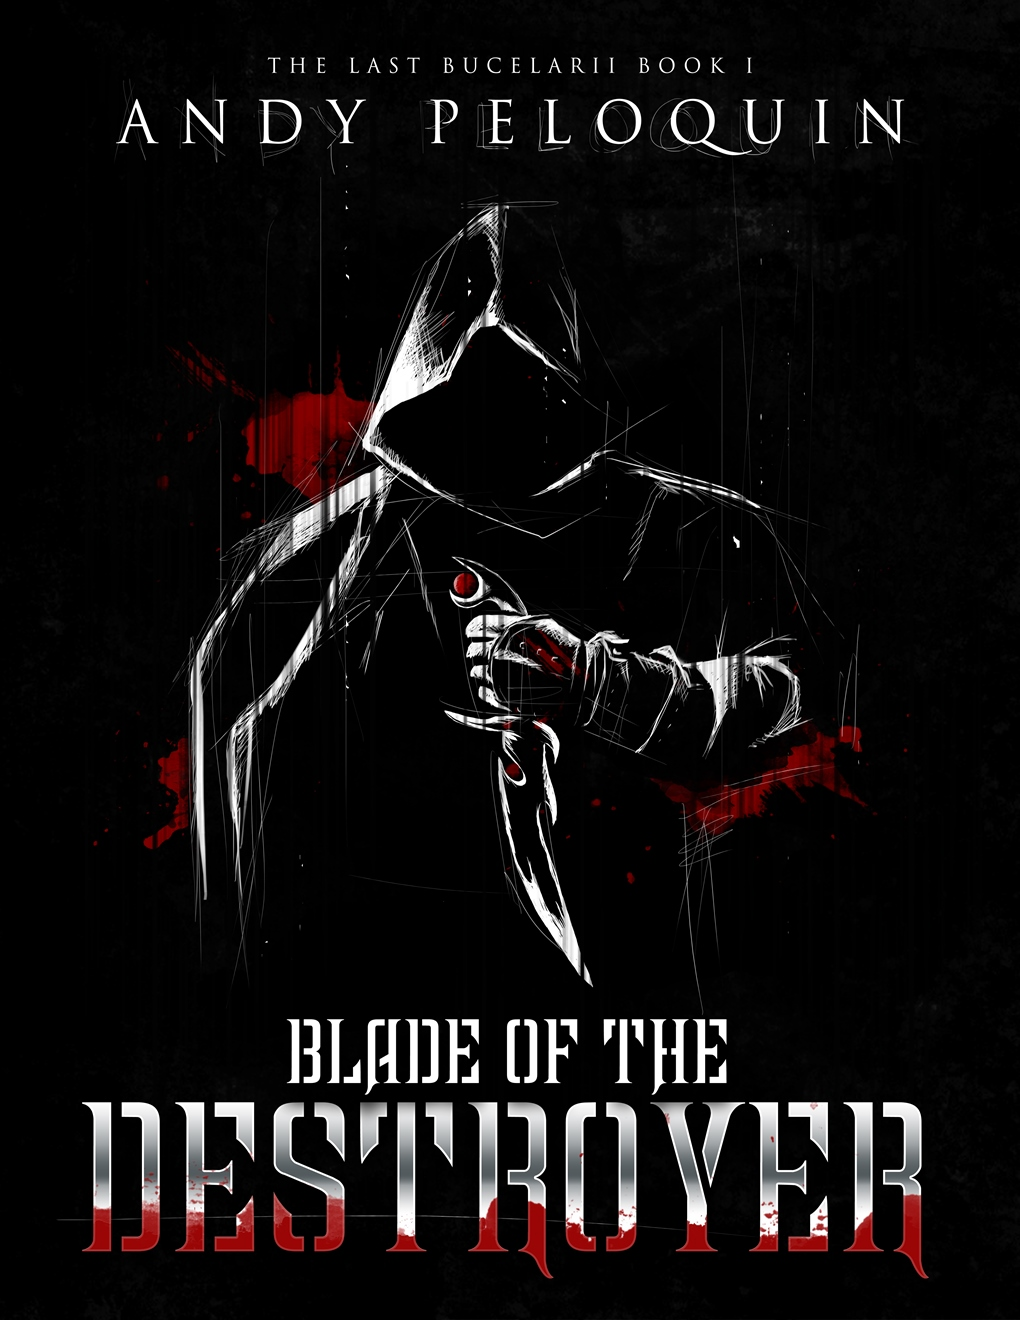 Blade of the Destroyer Battle